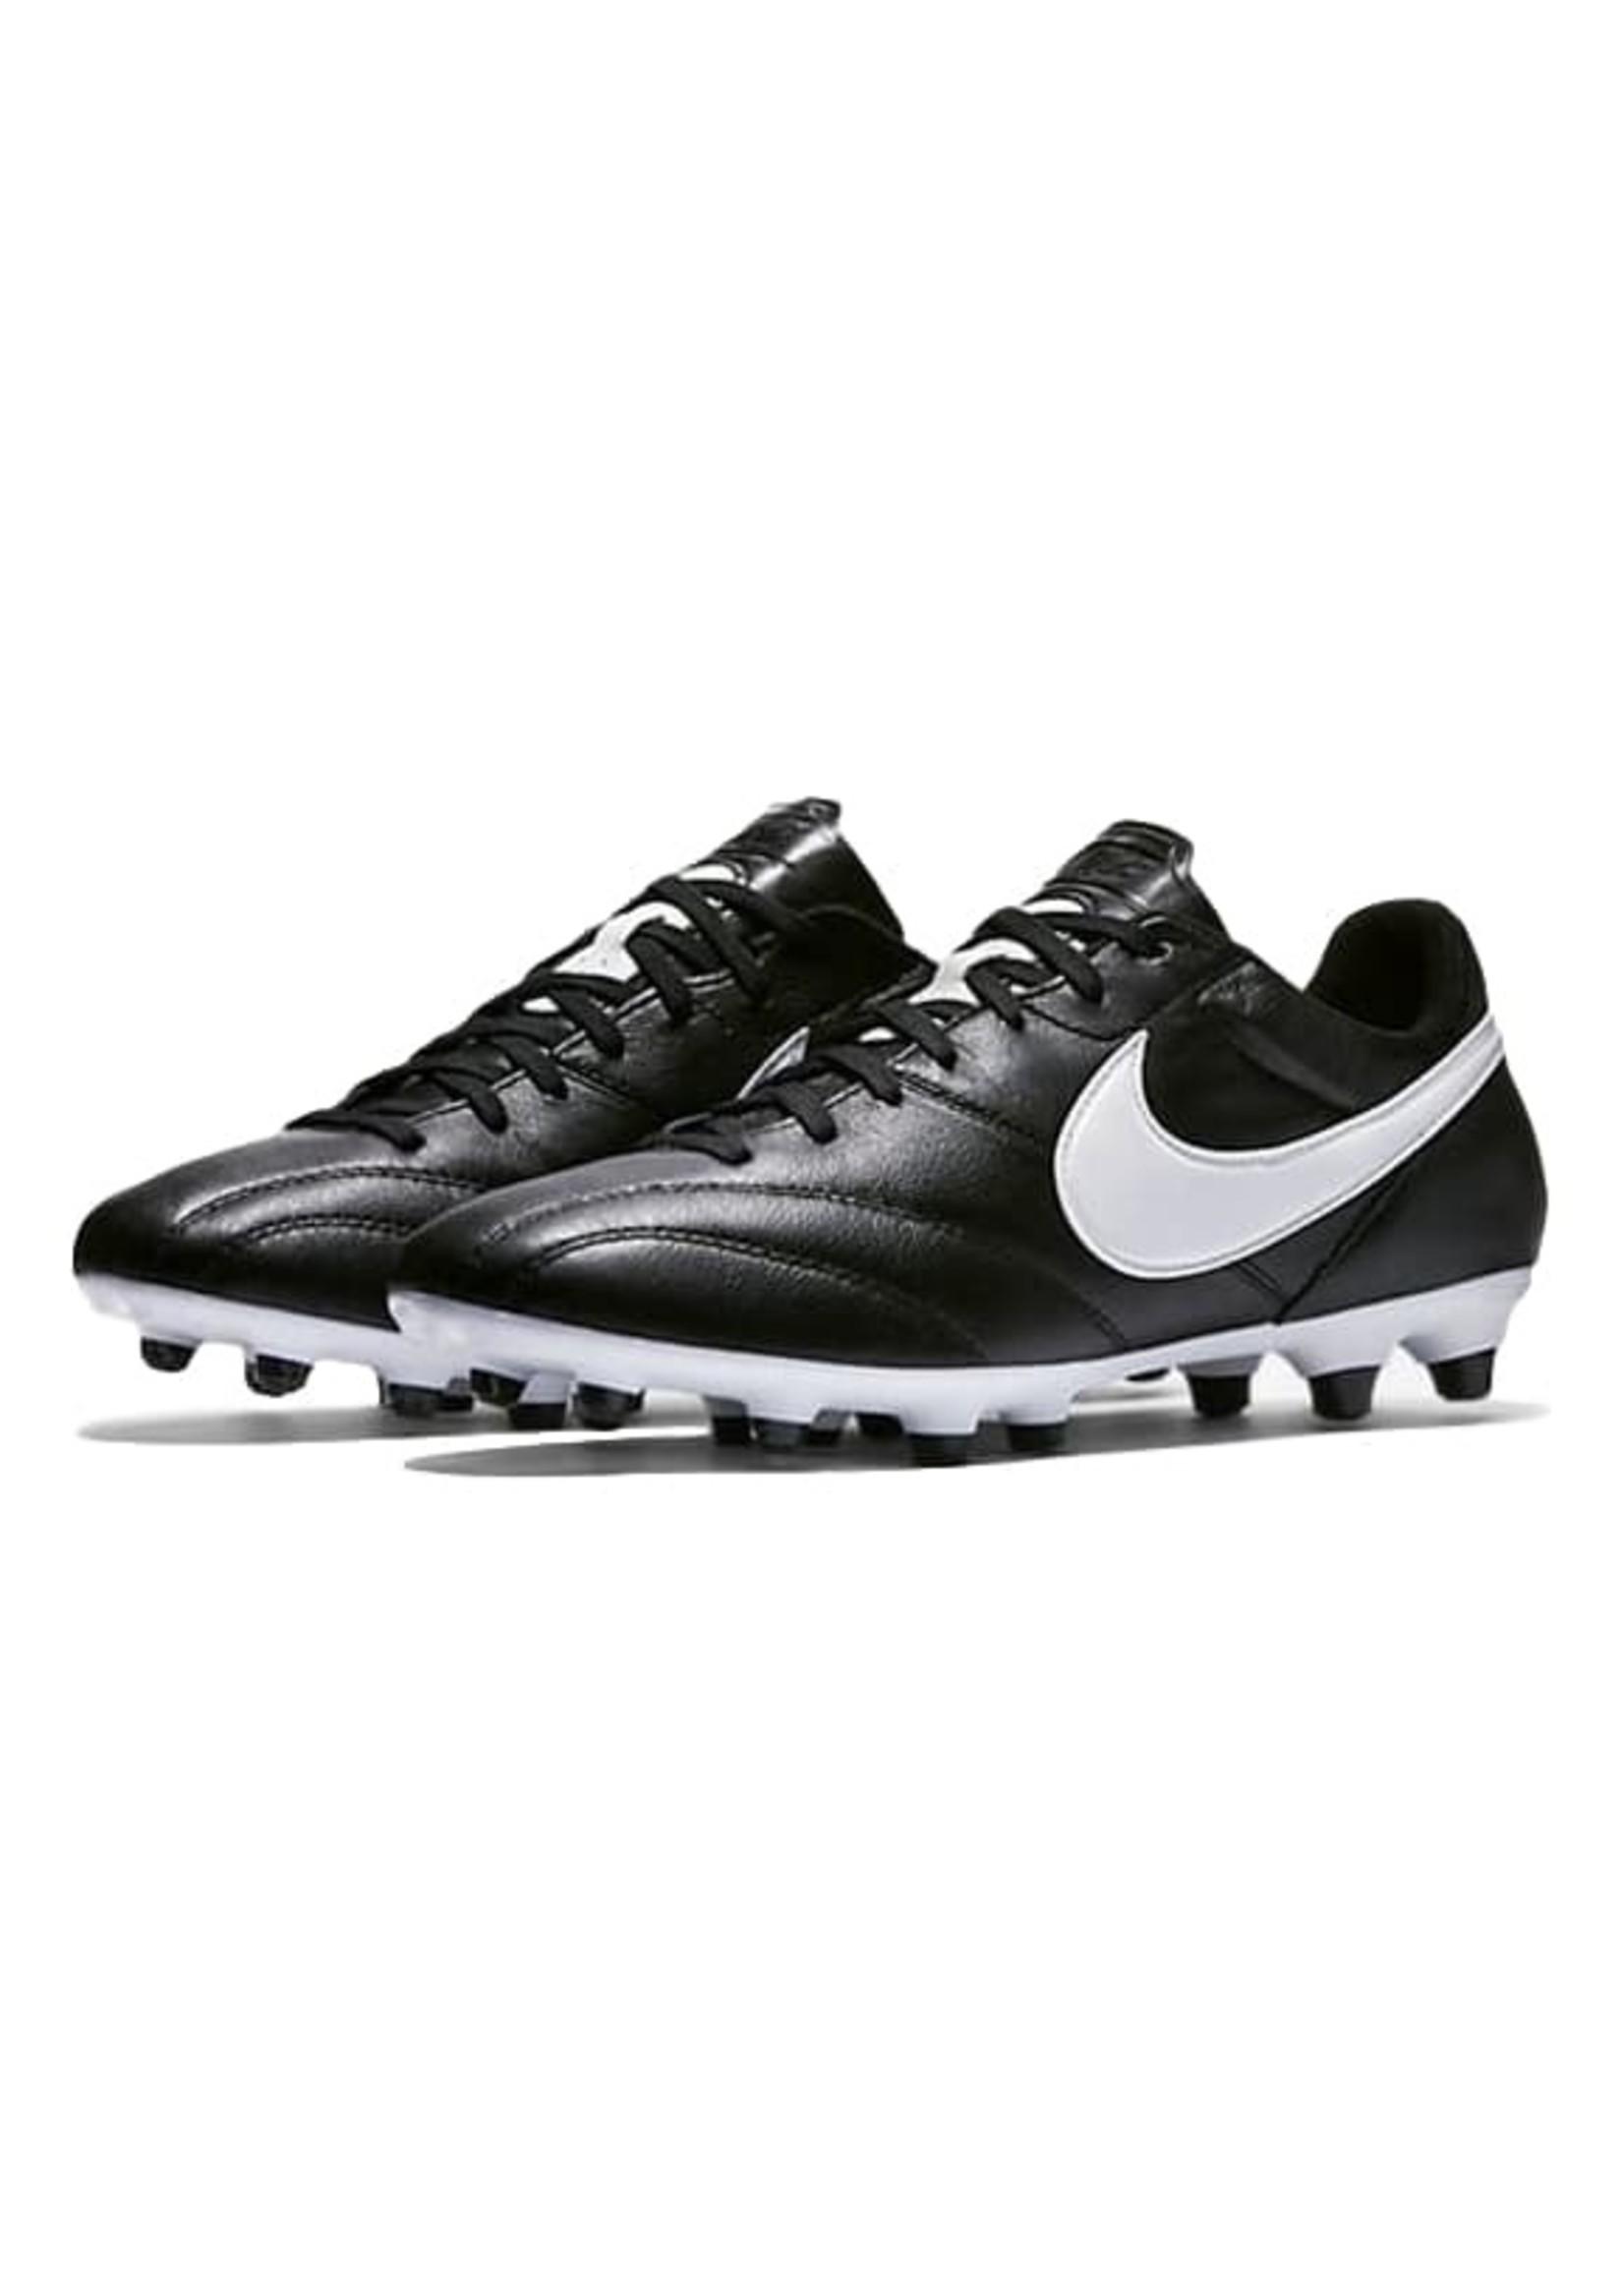 Nike Premier - Black/White